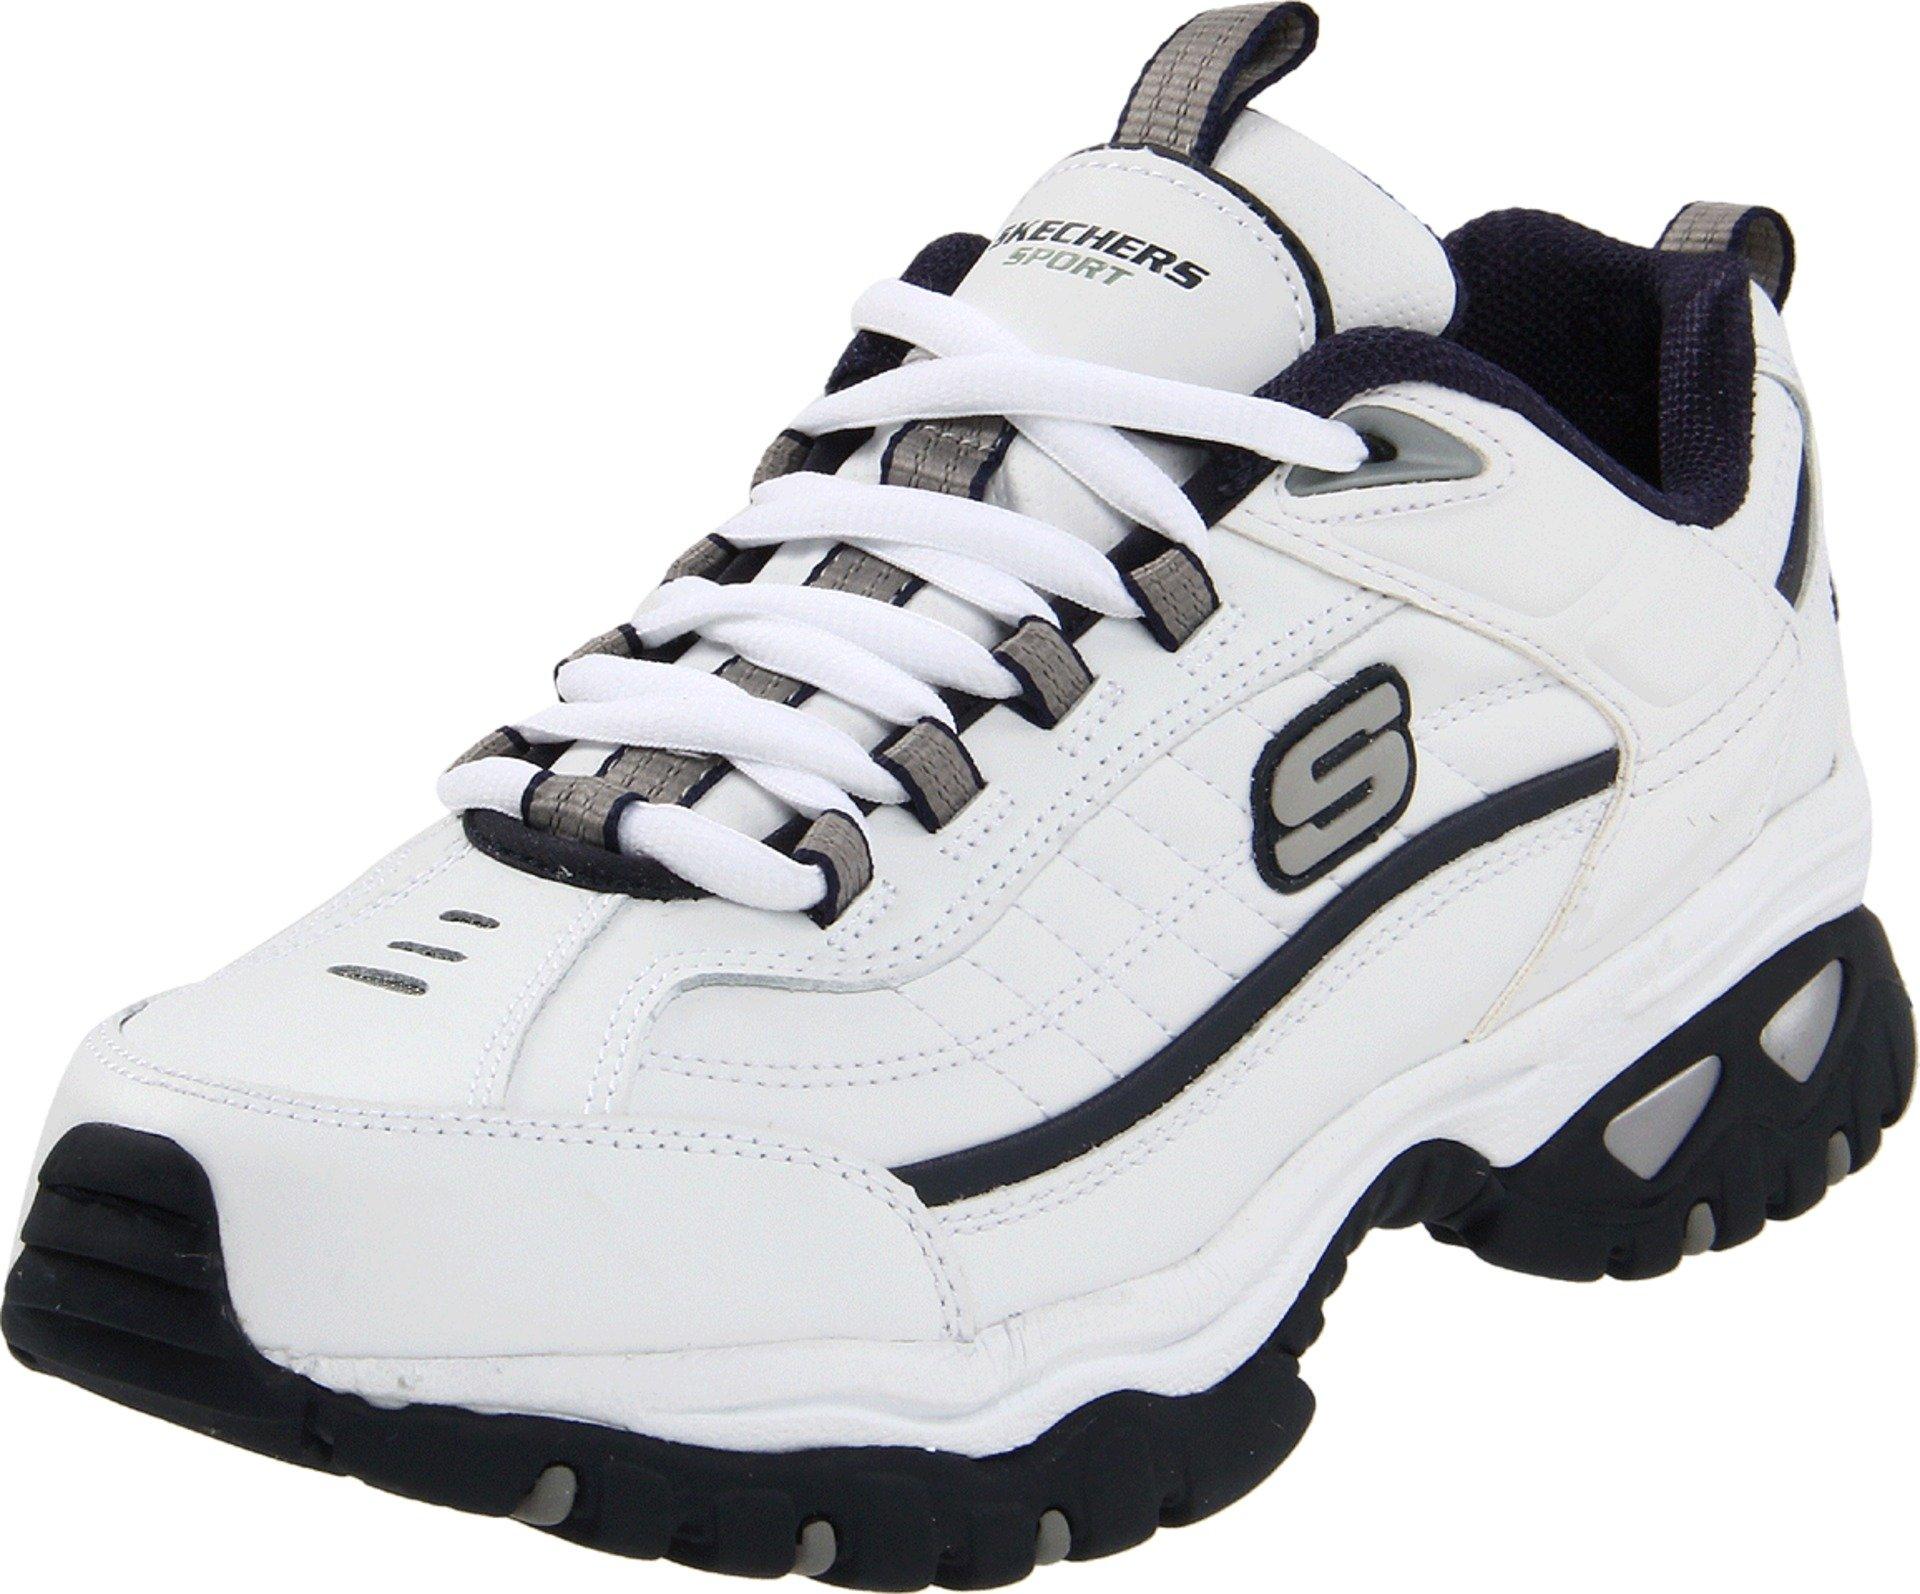 Skechers Energy Afterburn Lace Up Sneaker